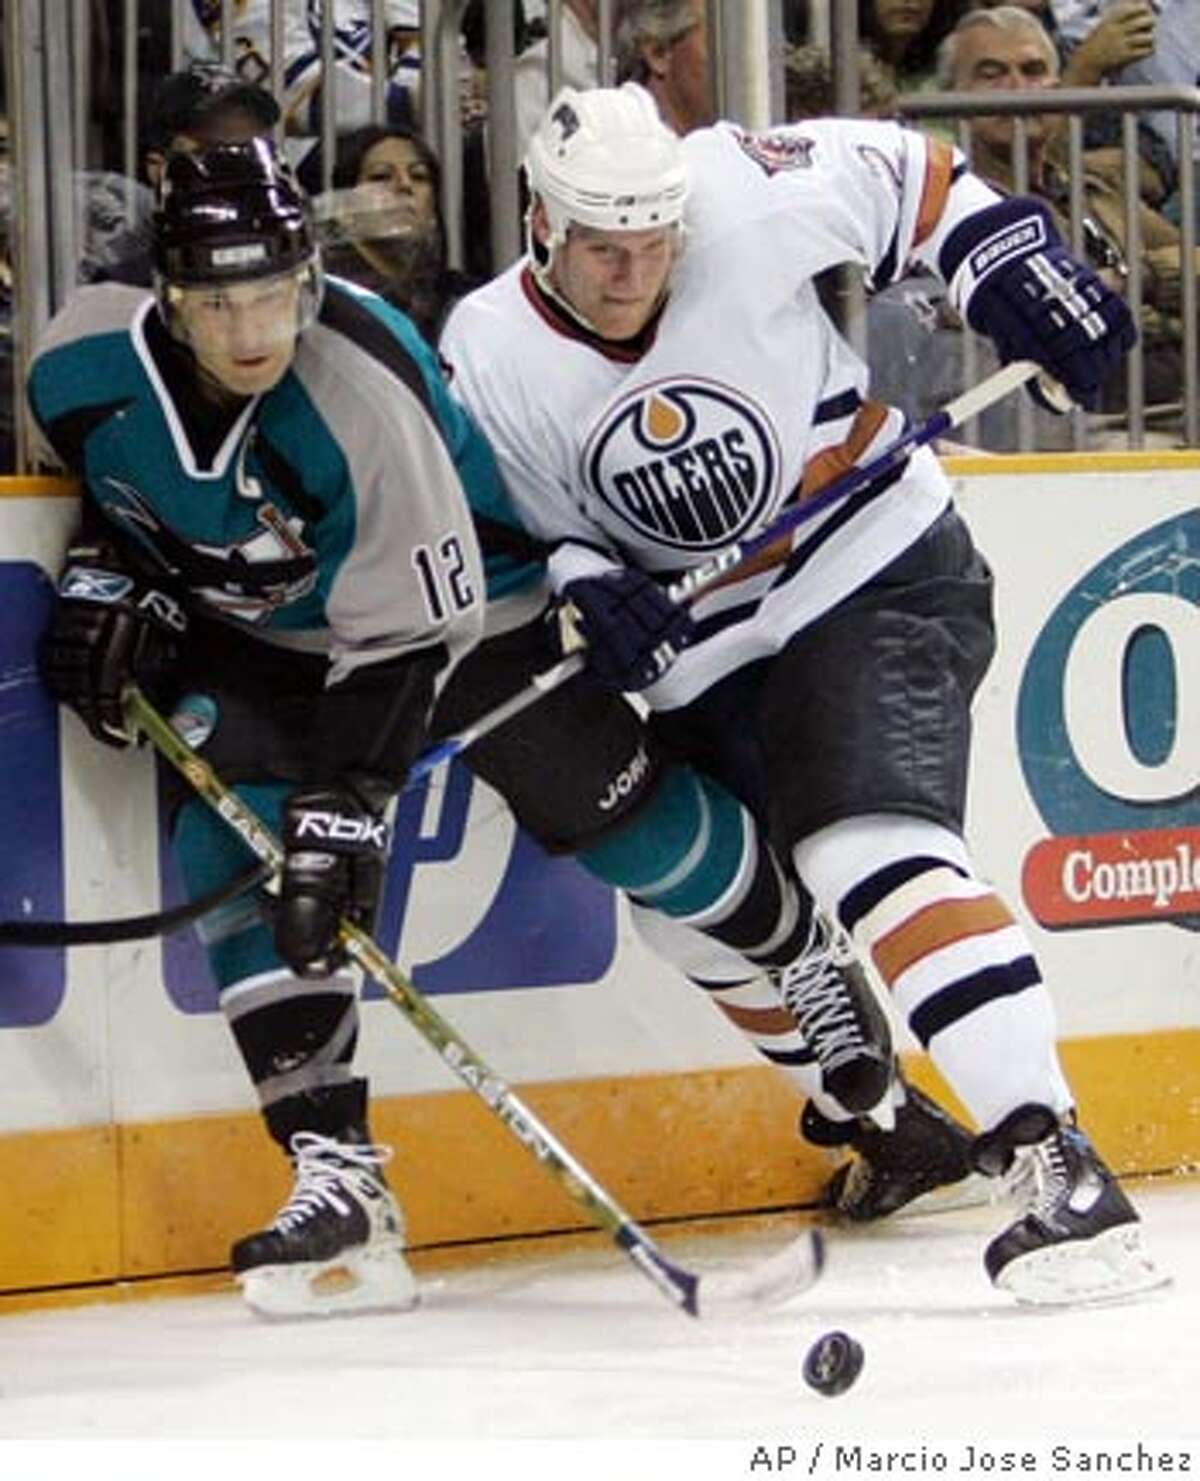 San Jose Sharks center Patrick Marleau, left, battles with Edmonton Oilers defenseman Matt Greene in the second period of an NHL hockey game in San Jose, Calif., Sunday, March 11, 2007.(AP Photo/Marcio Jose Sanchez)